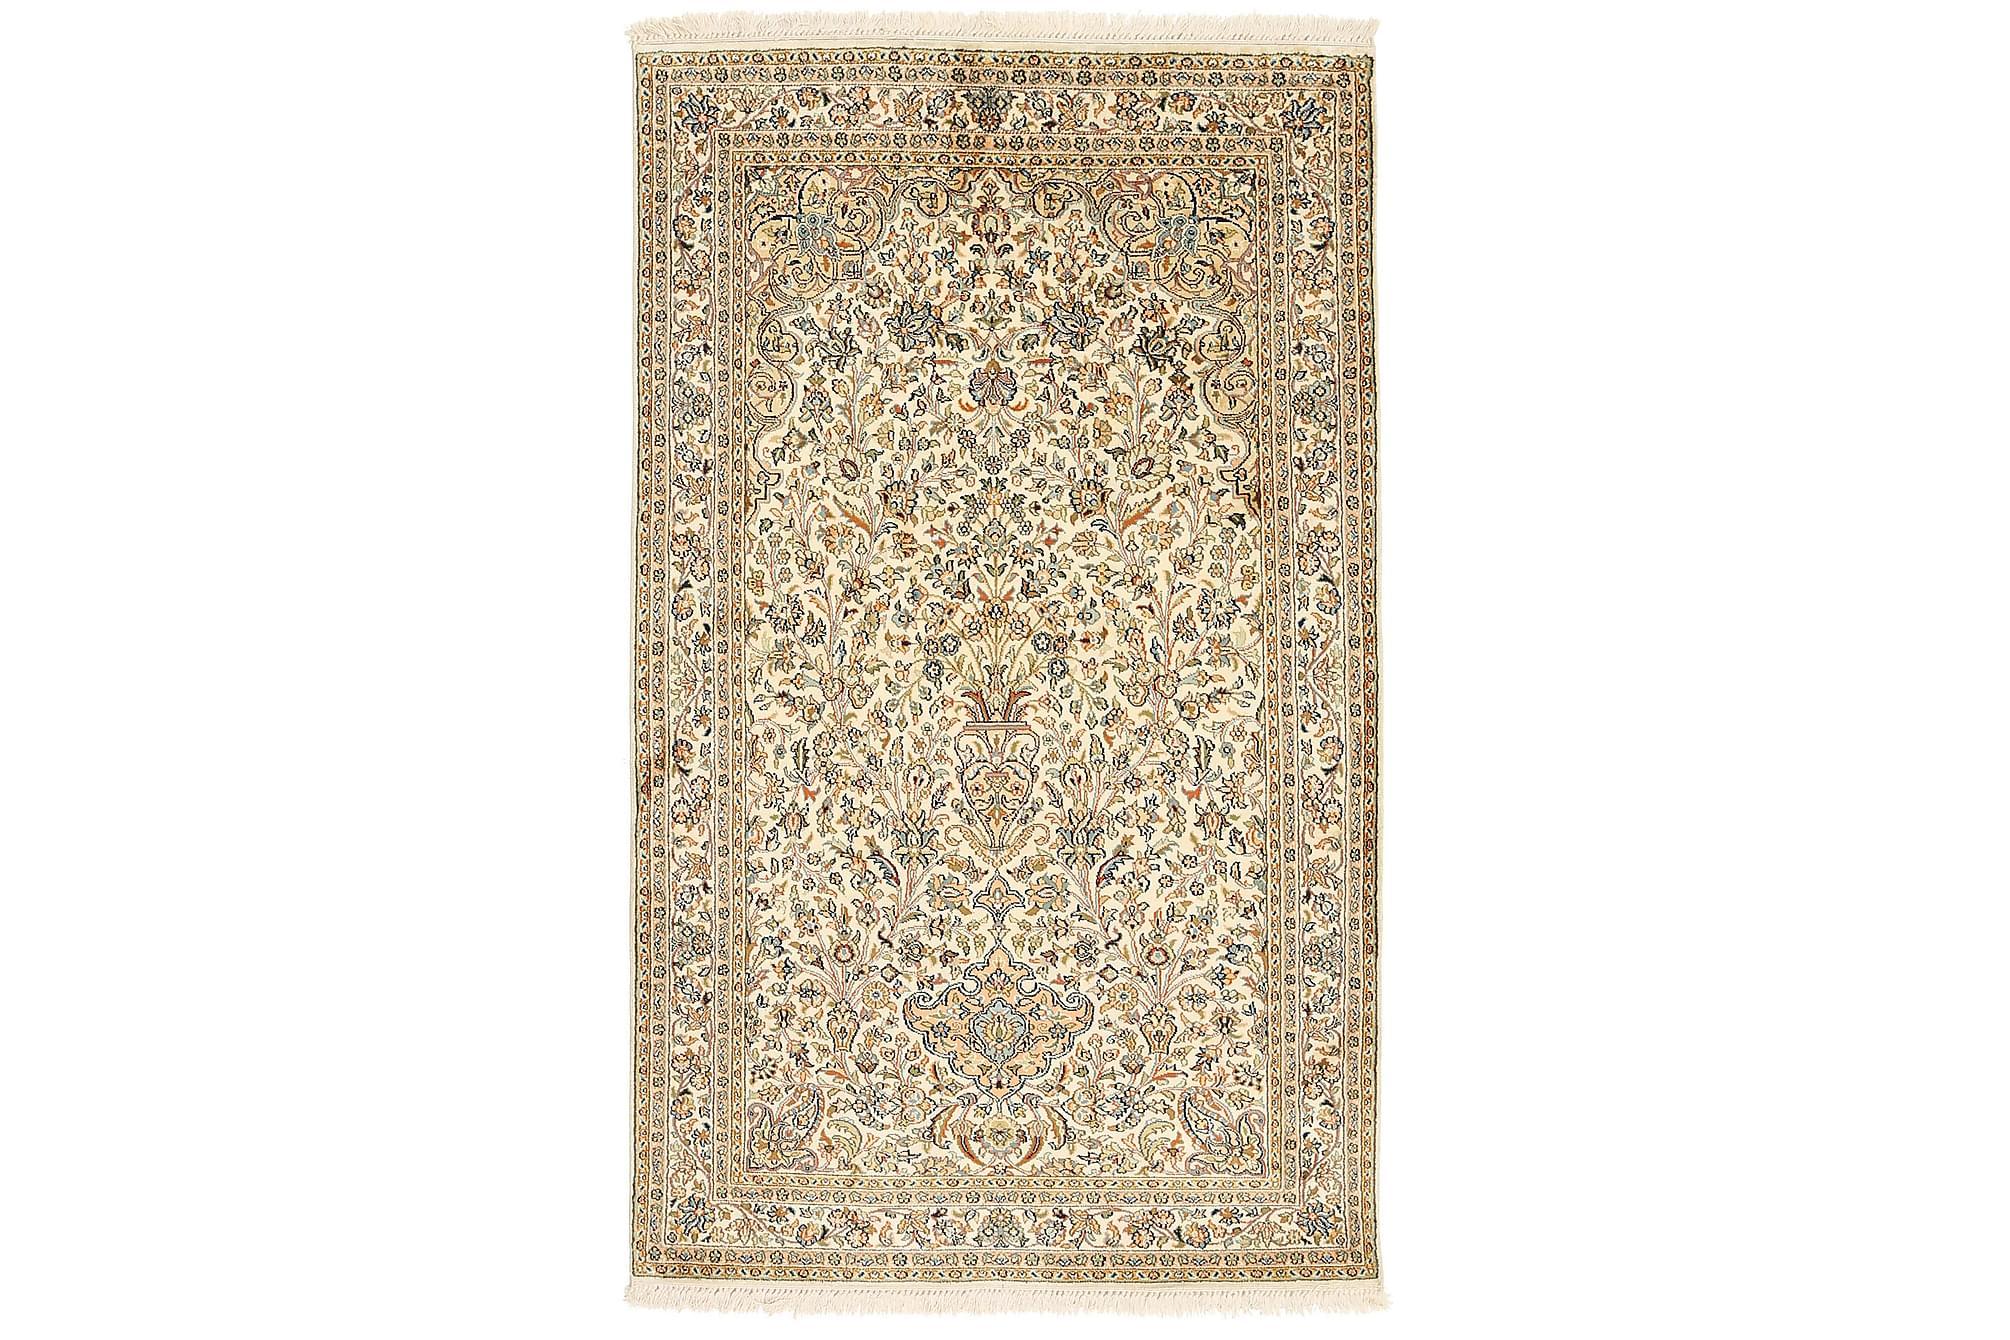 ORIENTALISK Silkesmatta Kashmir 96x158, Äkta silkesmattor